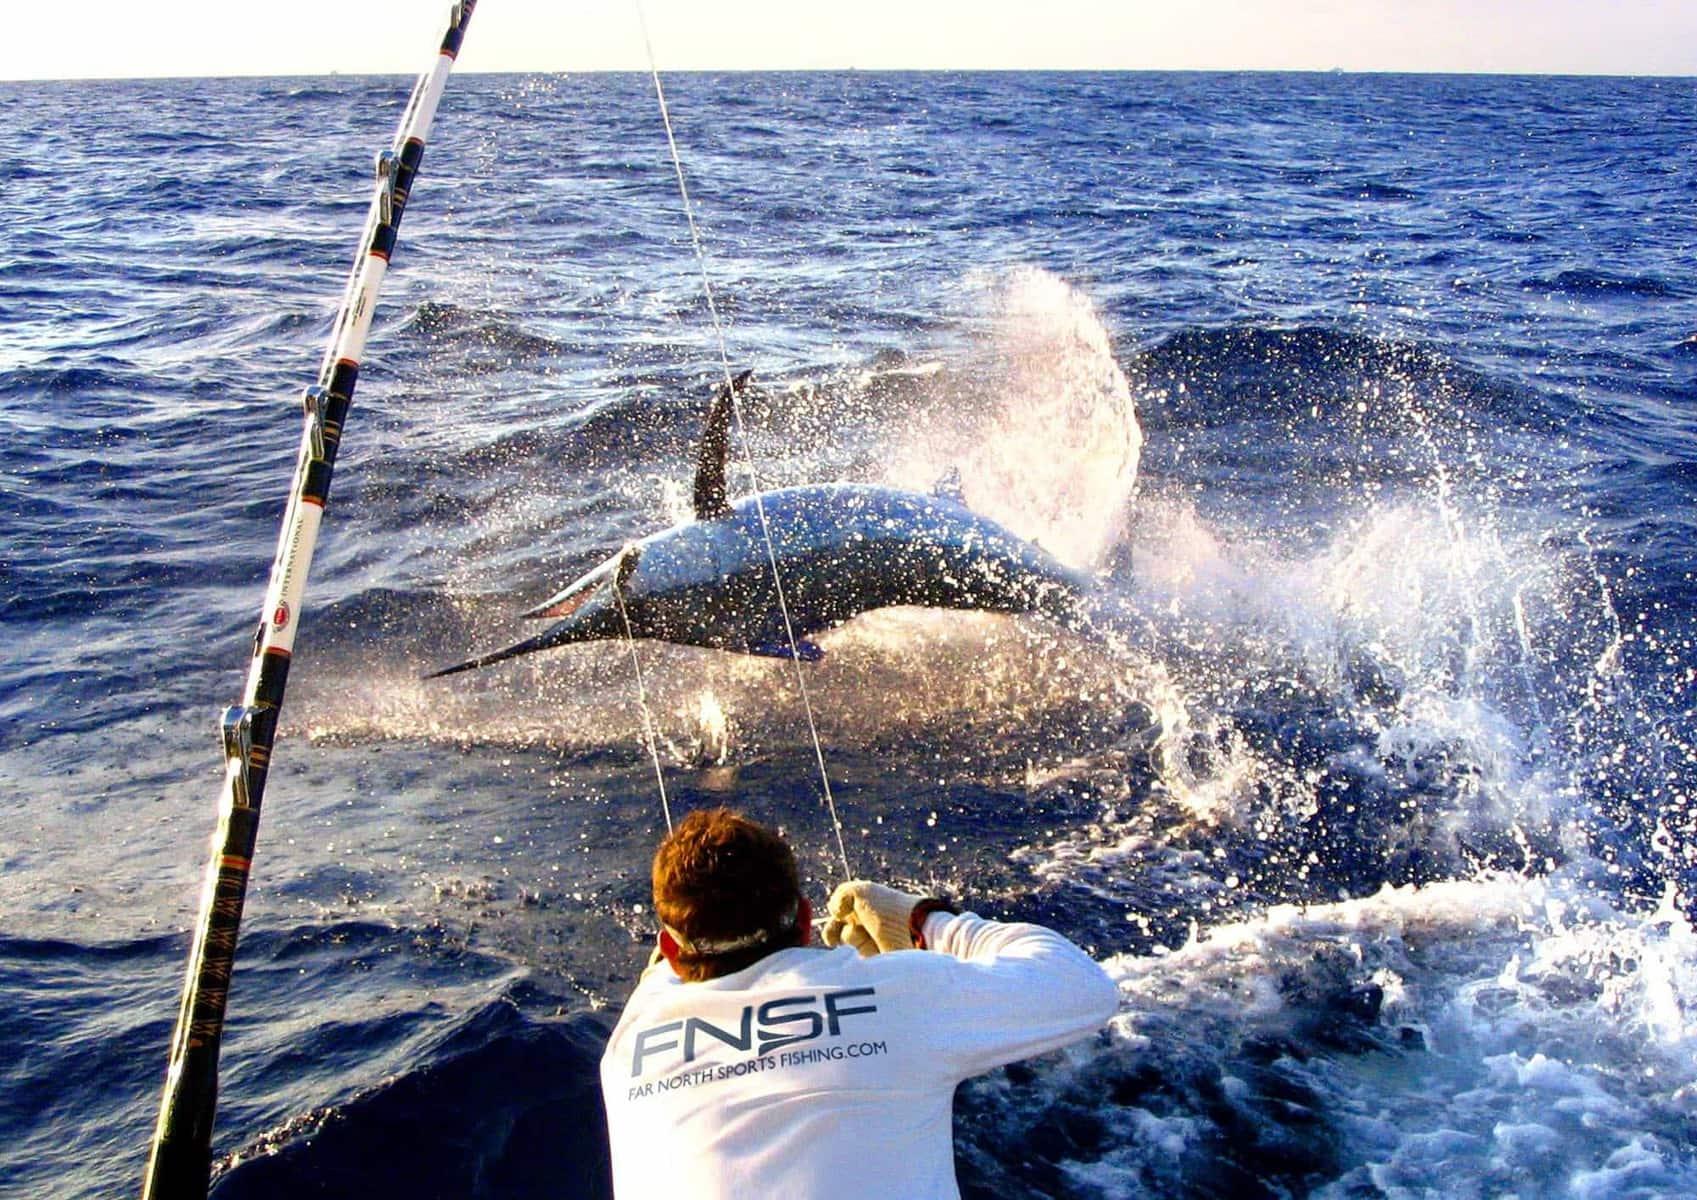 Marlin fishing port douglas far north sports fishing for Marlin fishing charters